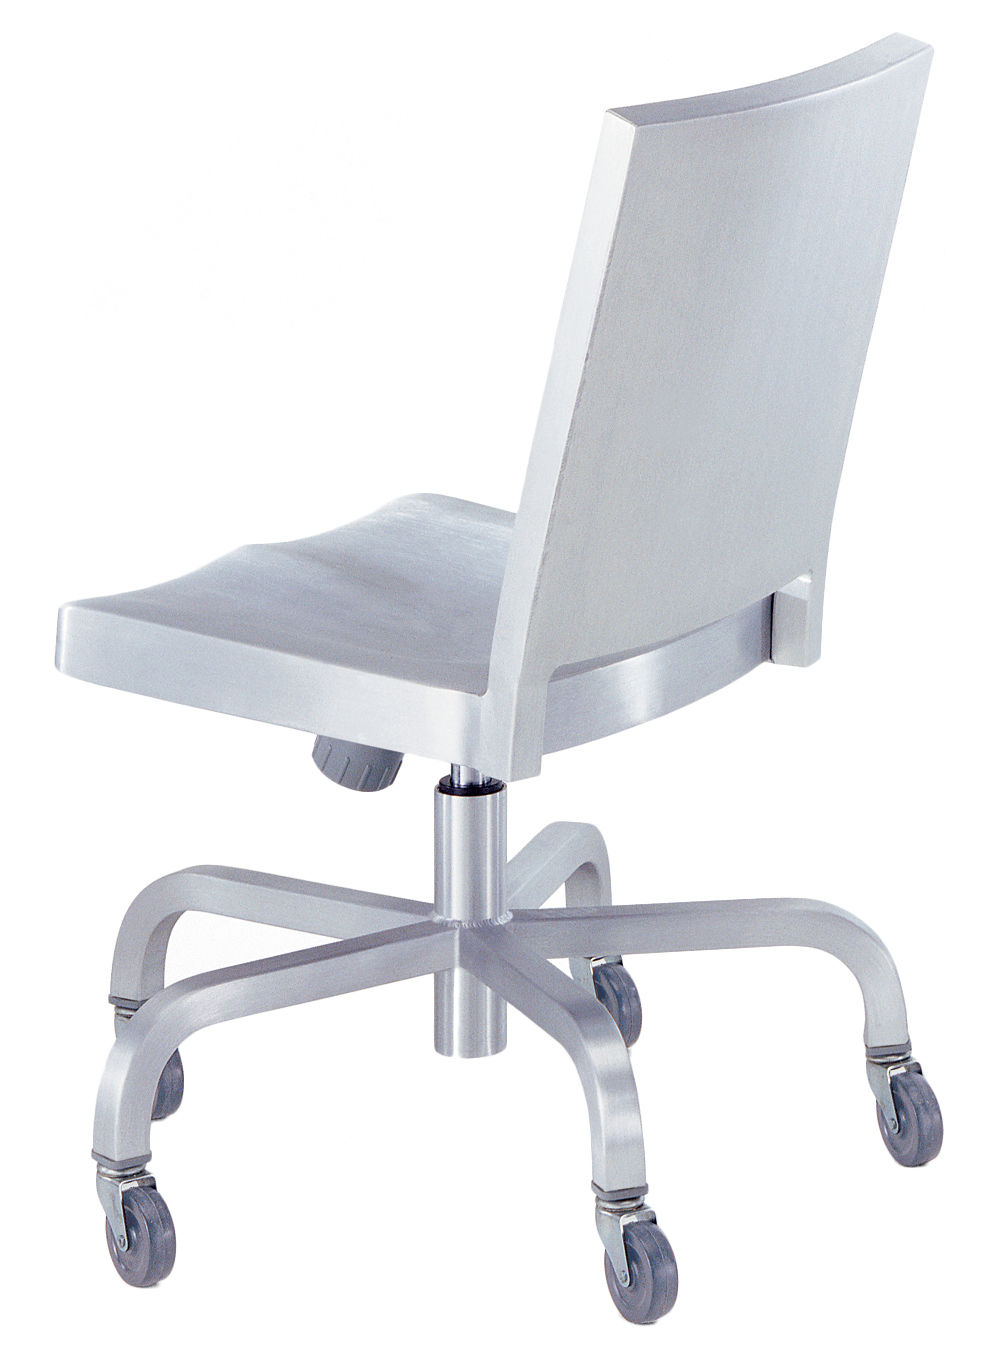 Mobilier - Fauteuils de bureau - Chaise à roulettes Hudson Outdoor / Alu brossé - Emeco - Alu brossé (outdoor) - Aluminium brossé recyclé